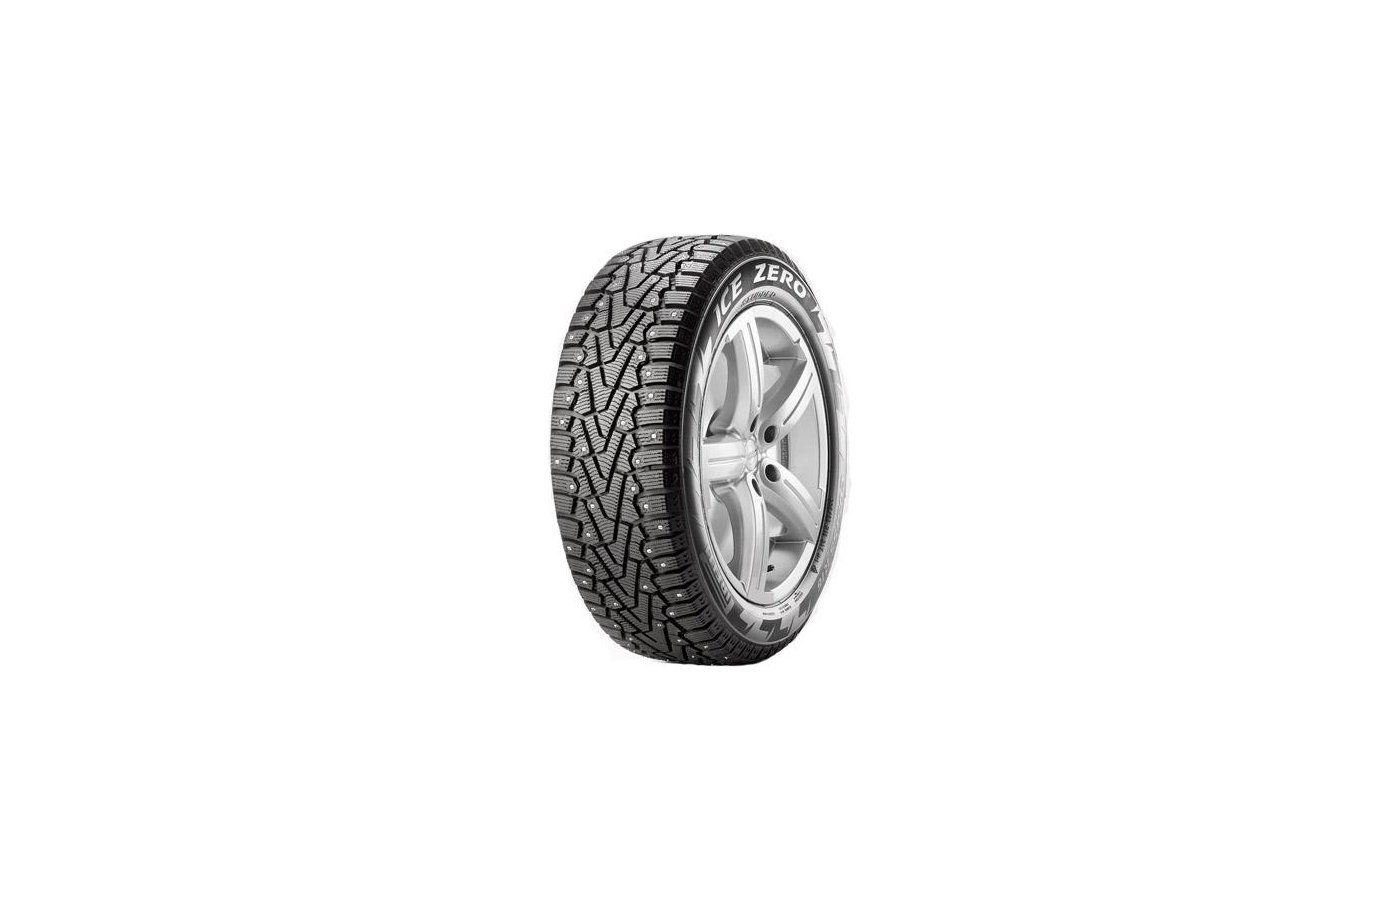 Шина Pirelli Winter Ice Zero 205/60 R16 TL 96T XL шип